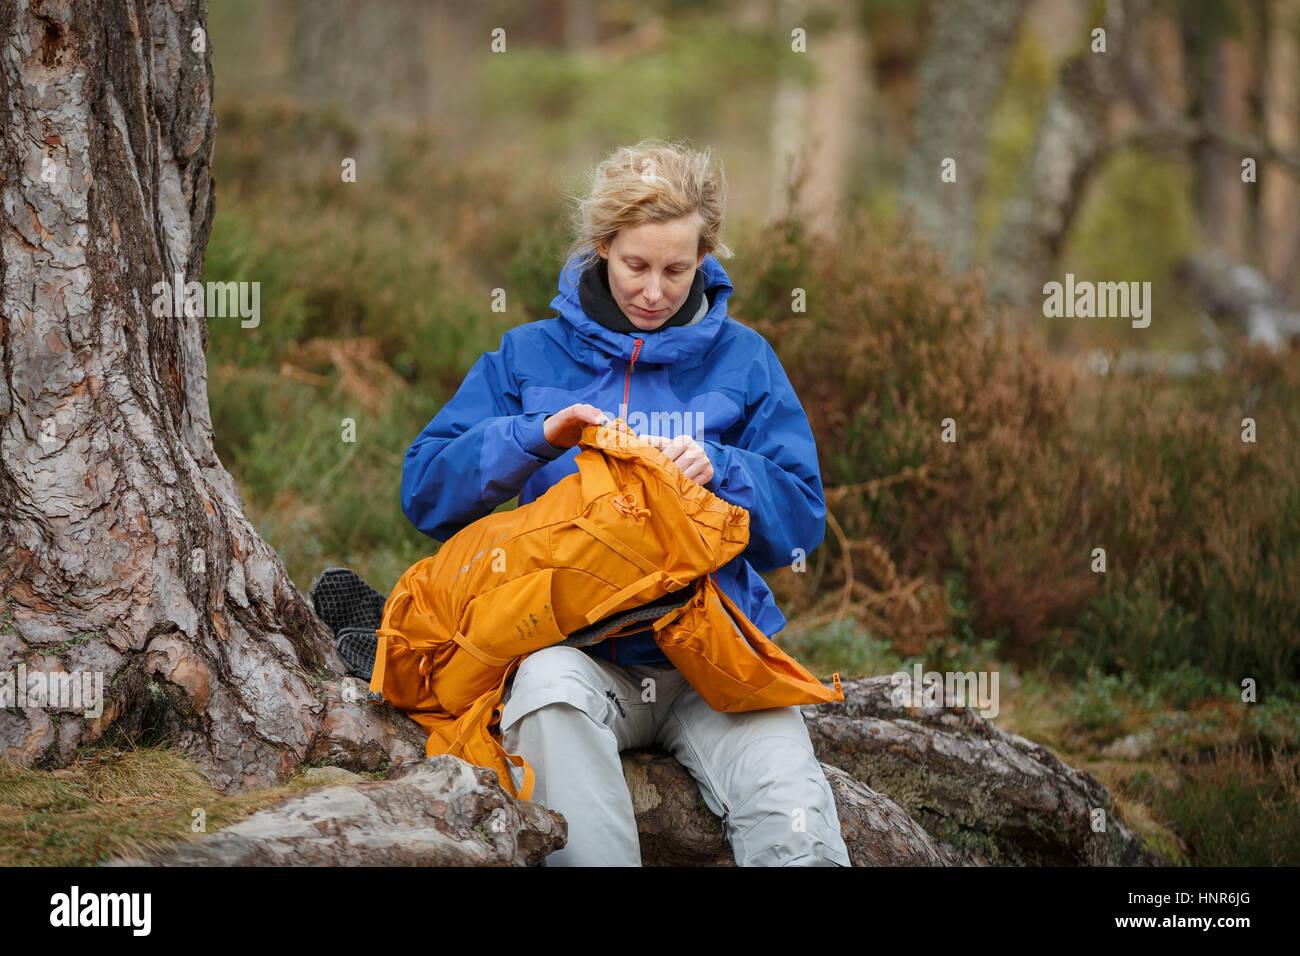 Woman hiking in Scotland - Stock Image